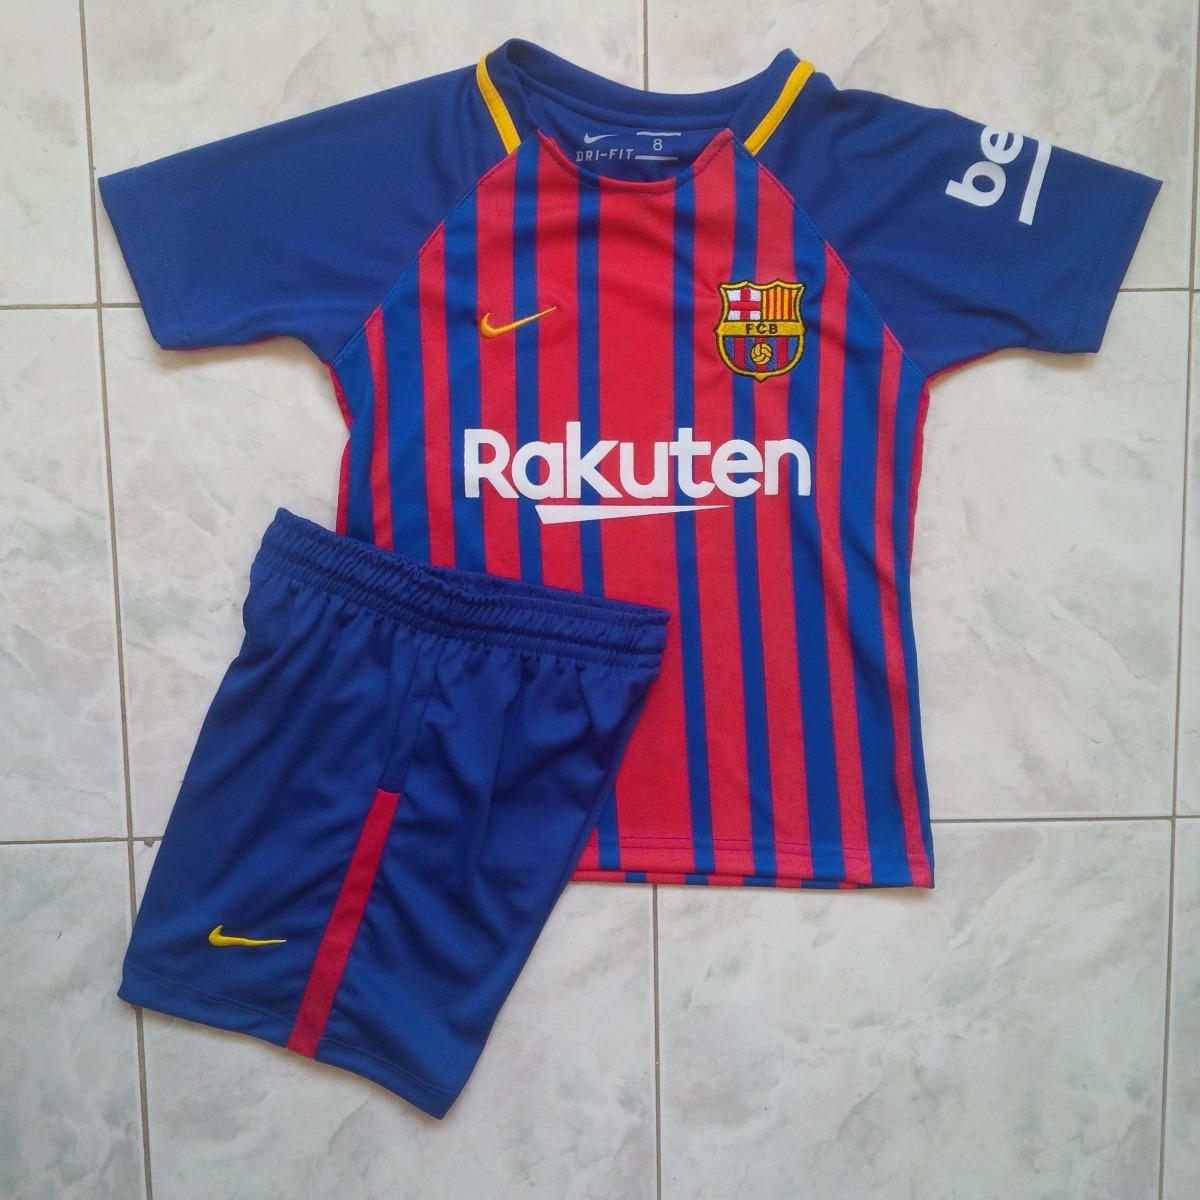 e69d662732611 uniforme conjunto barcelona local 2017-2018 rakuten niños. Cargando zoom.